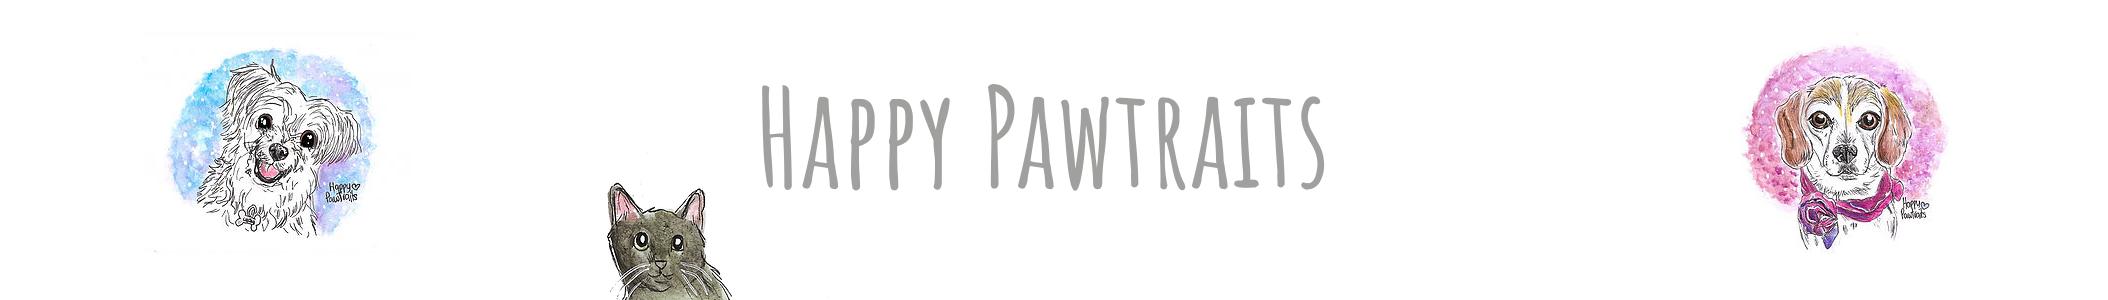 happy pawtraits bearhugs teddy